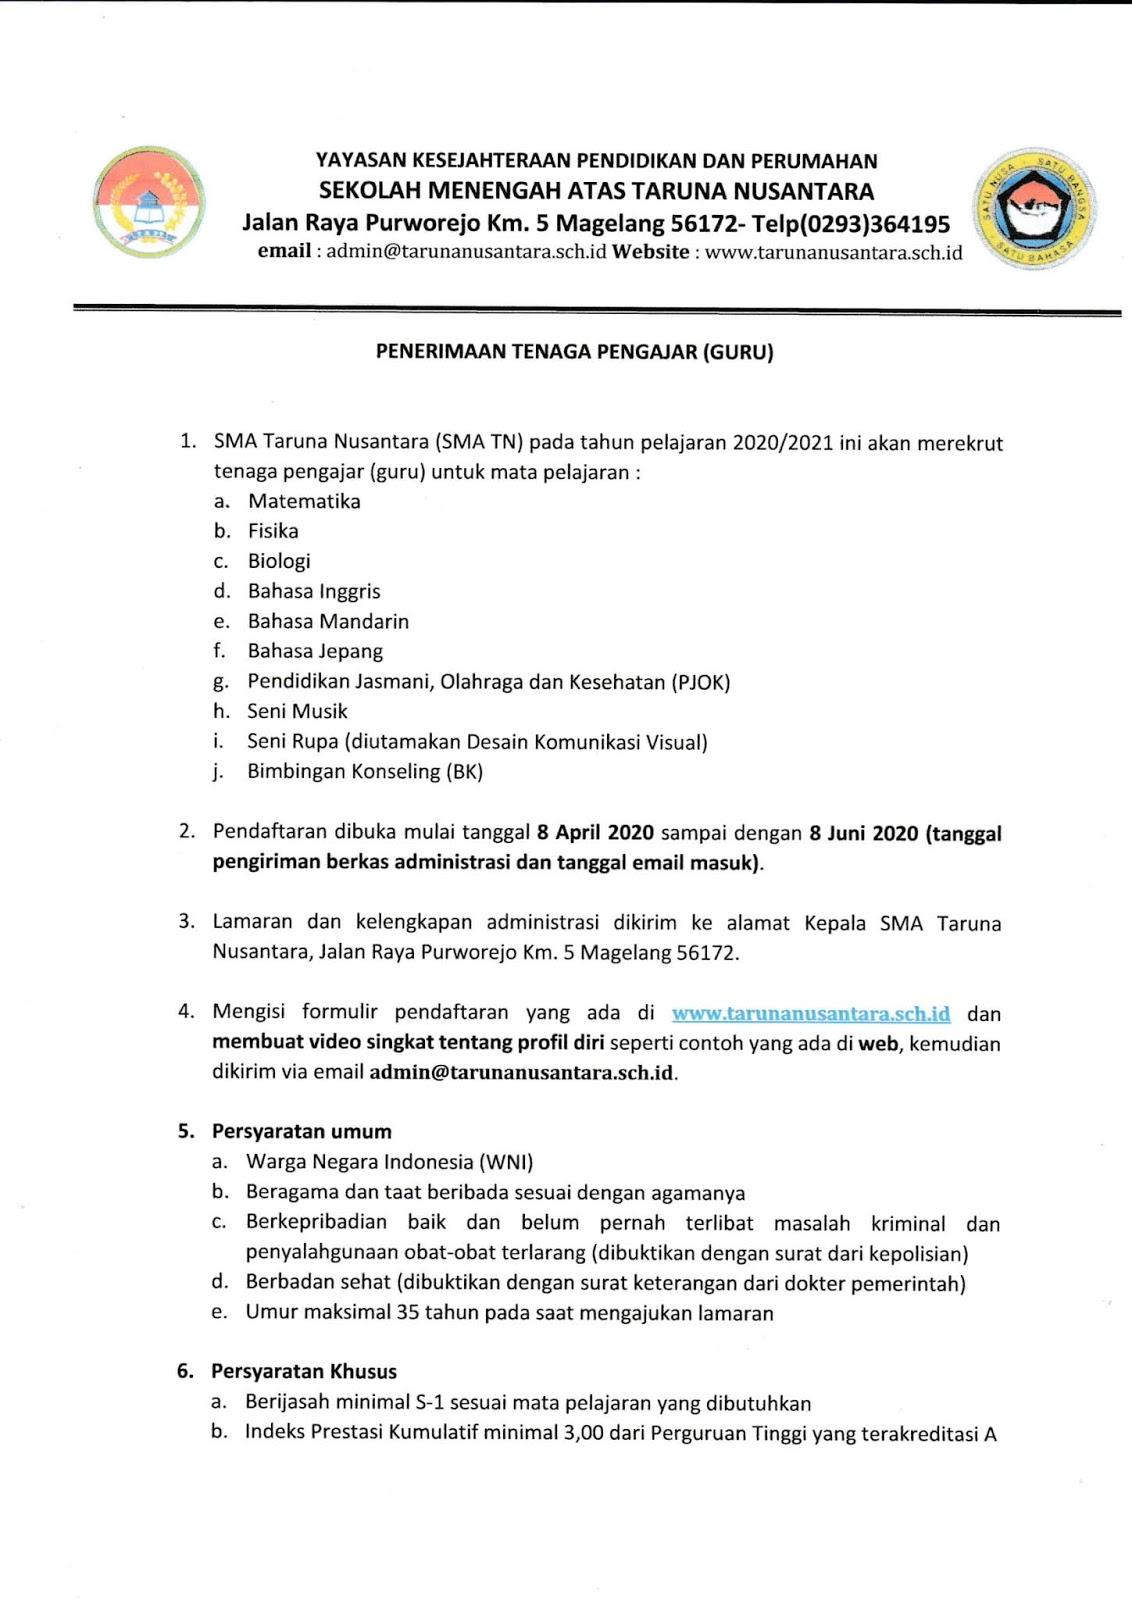 Lowongan Kerja Terbaru SMA Taruna Nusantara Tenaga Pengajar Bulan April 2020